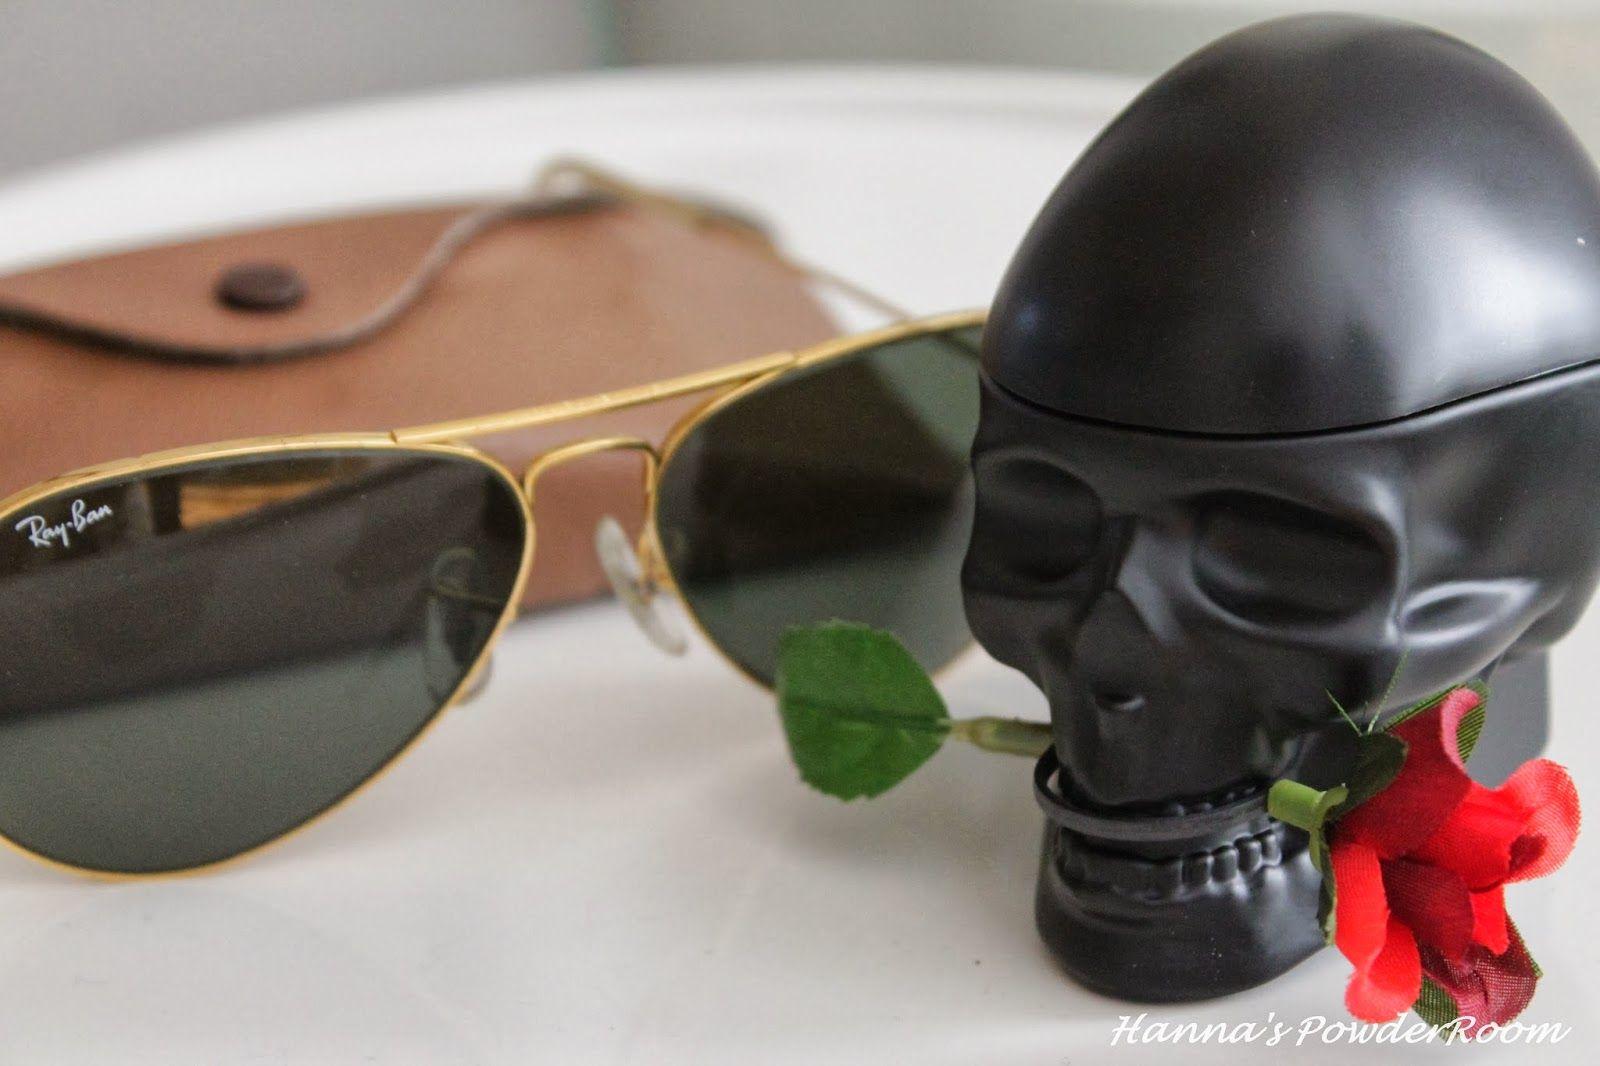 Ed Hardy skulls & roses for him Hanna's PowderRoom Blog